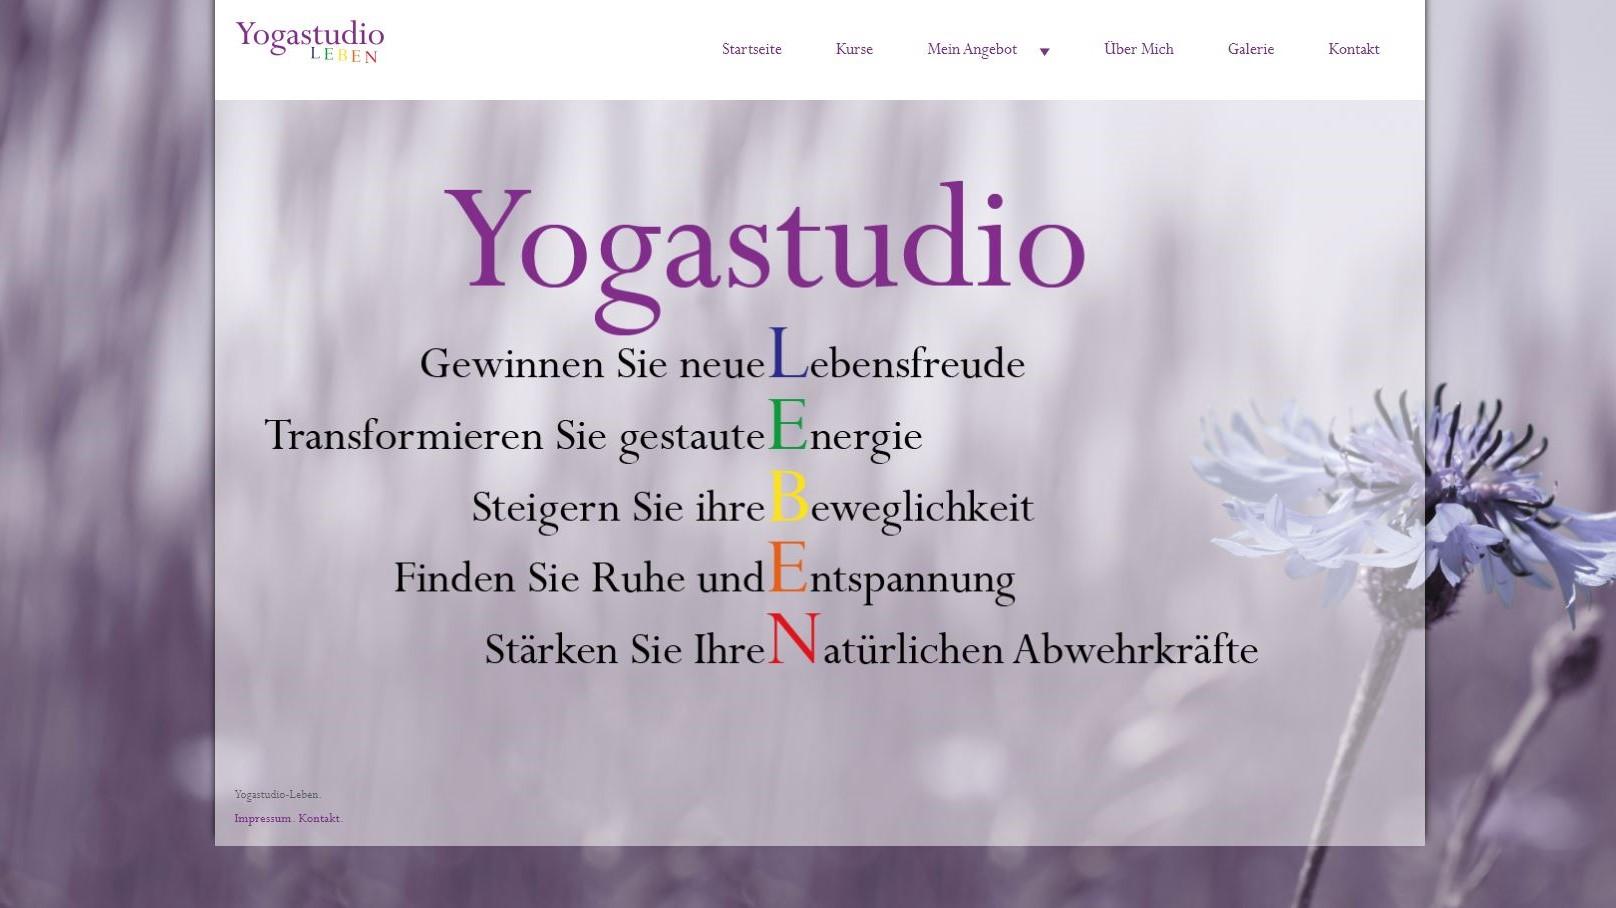 Yogastudio Leben